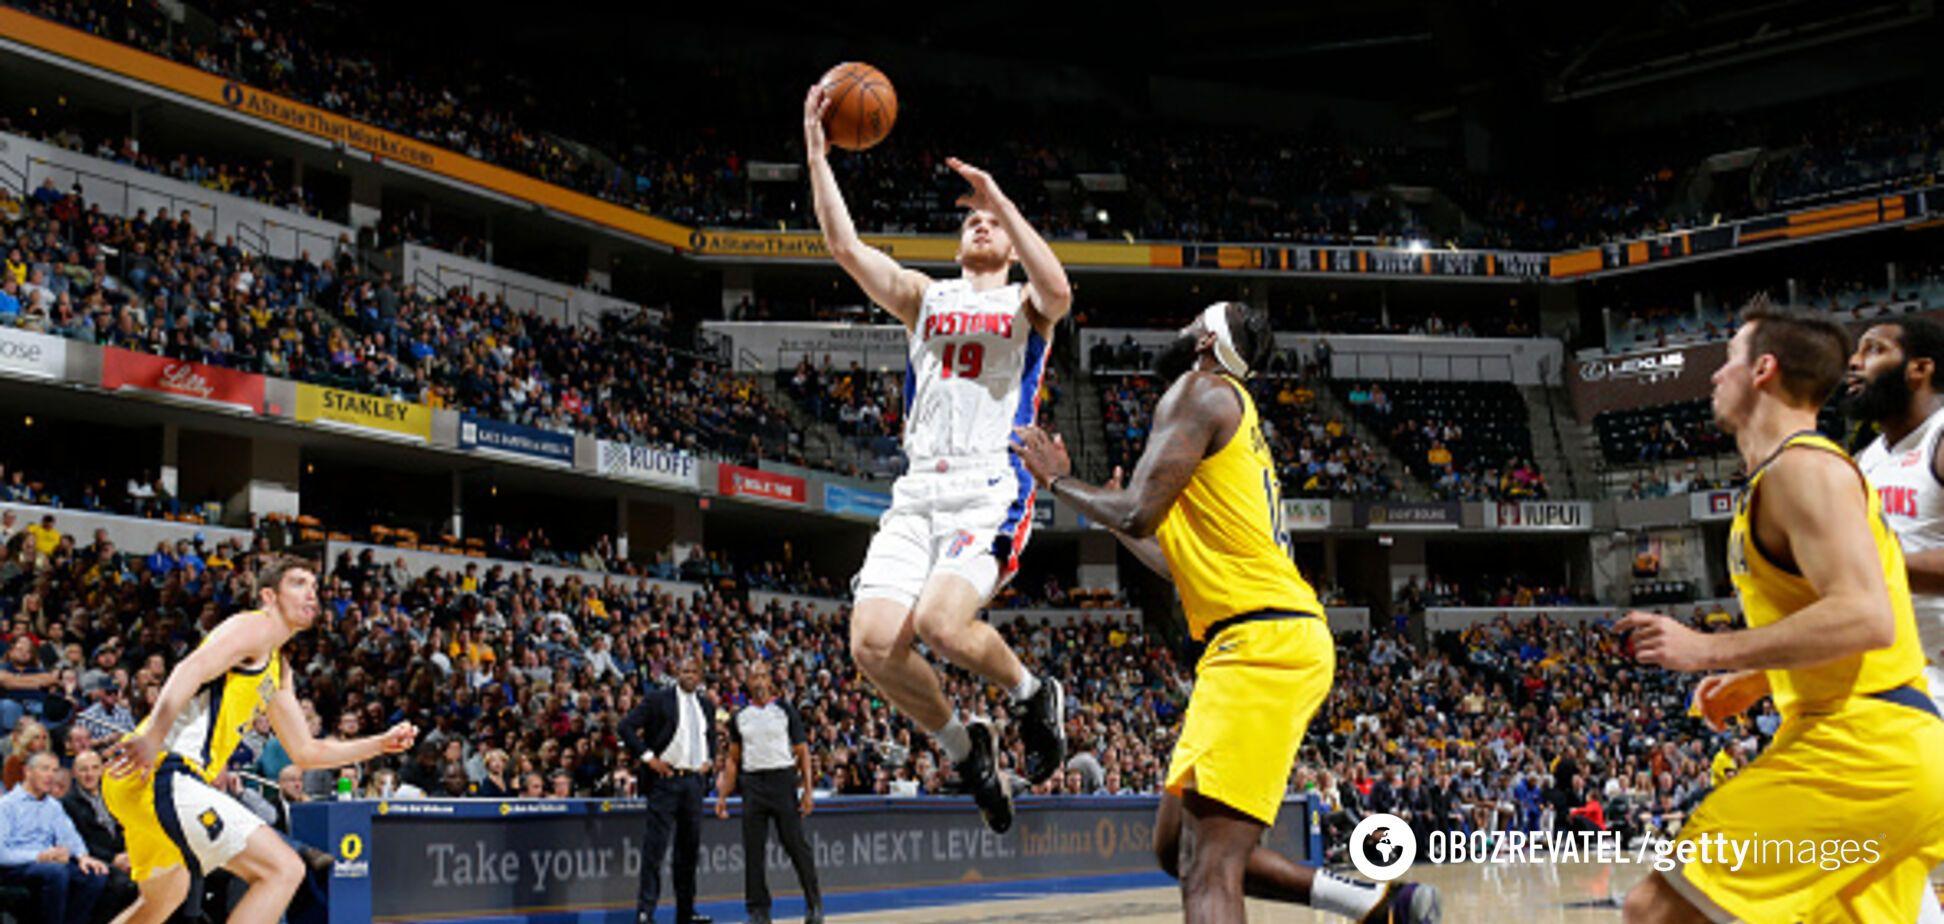 Українець Михайлюк провів успішний матч в НБА